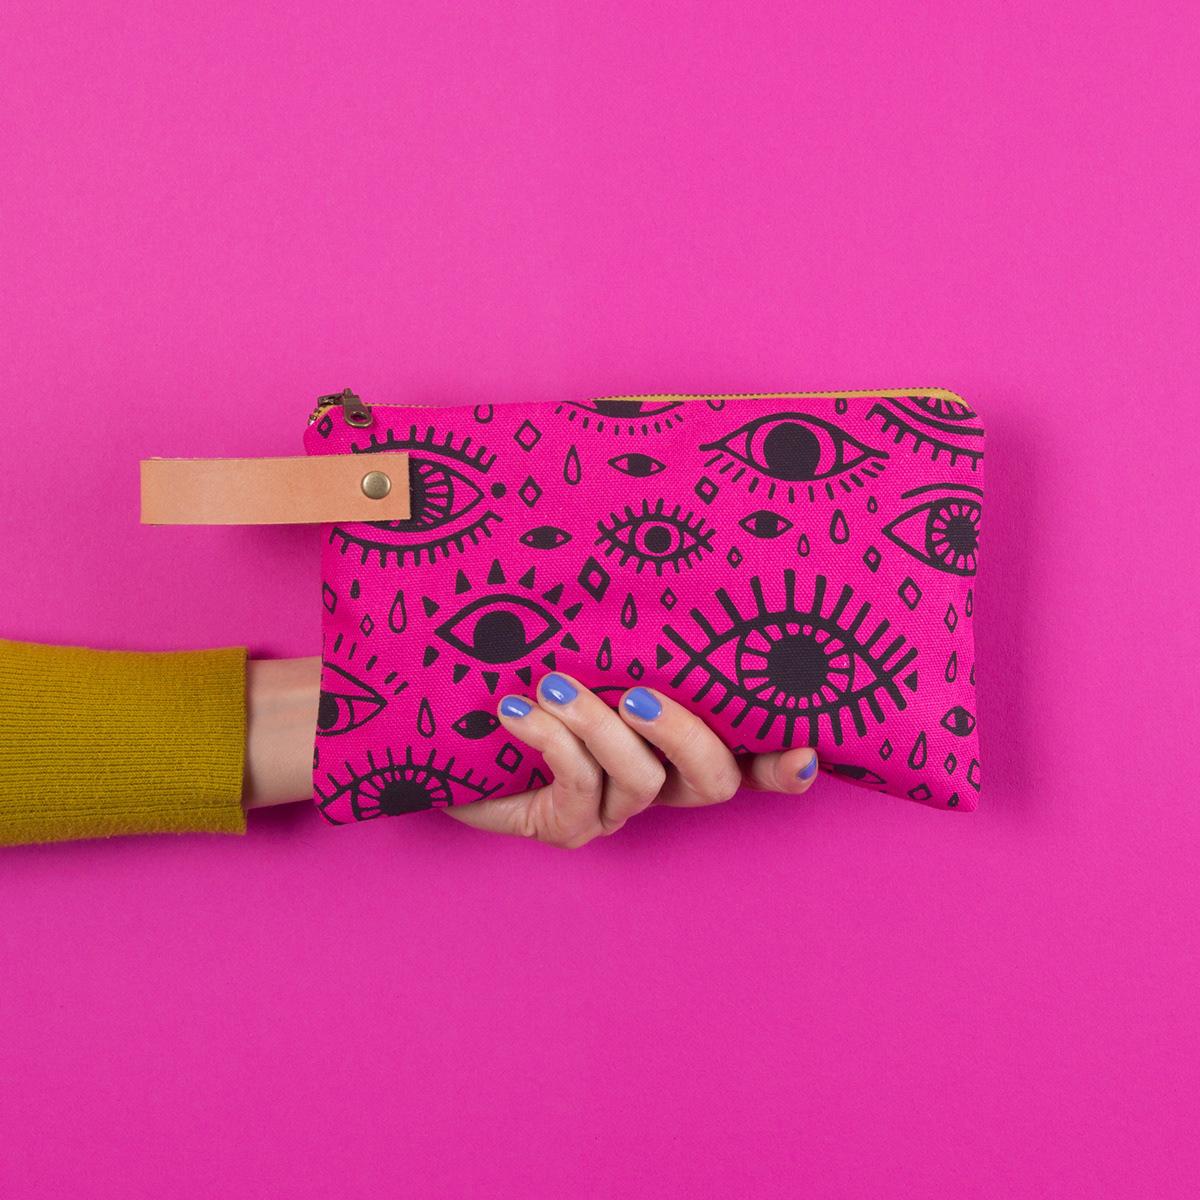 pattern textile screen print silkscreen pattern design  color product design  handmade hand printed hand-drawn